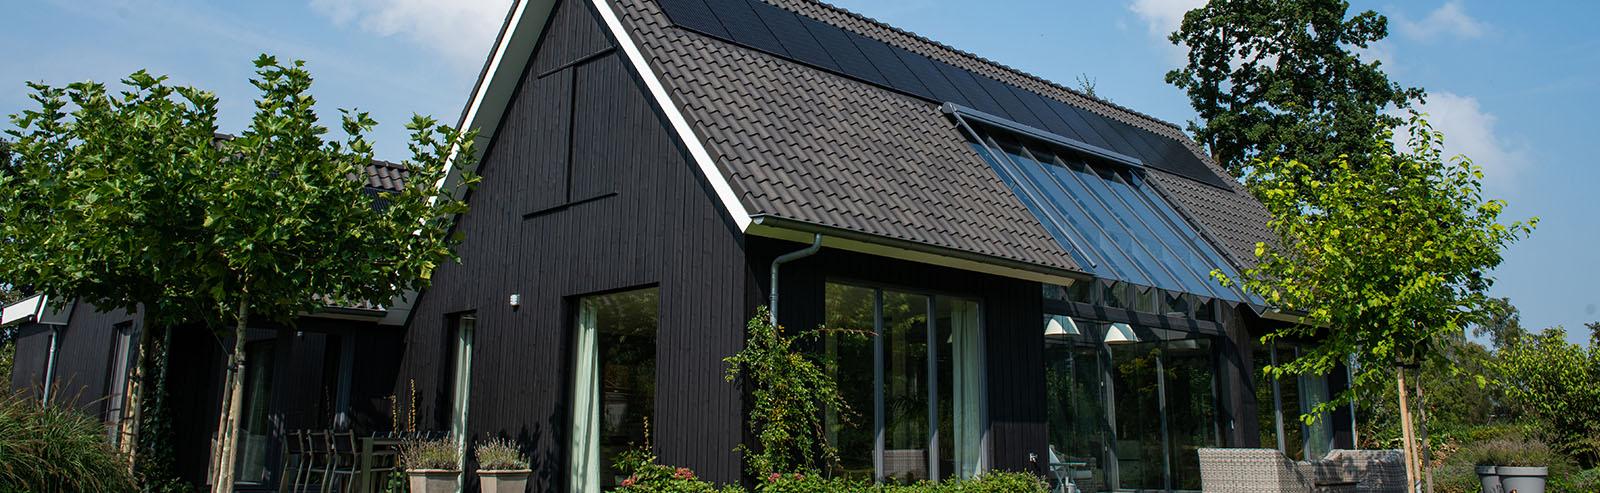 nieuwbouw-woning-bouwbedrijf-reurink5